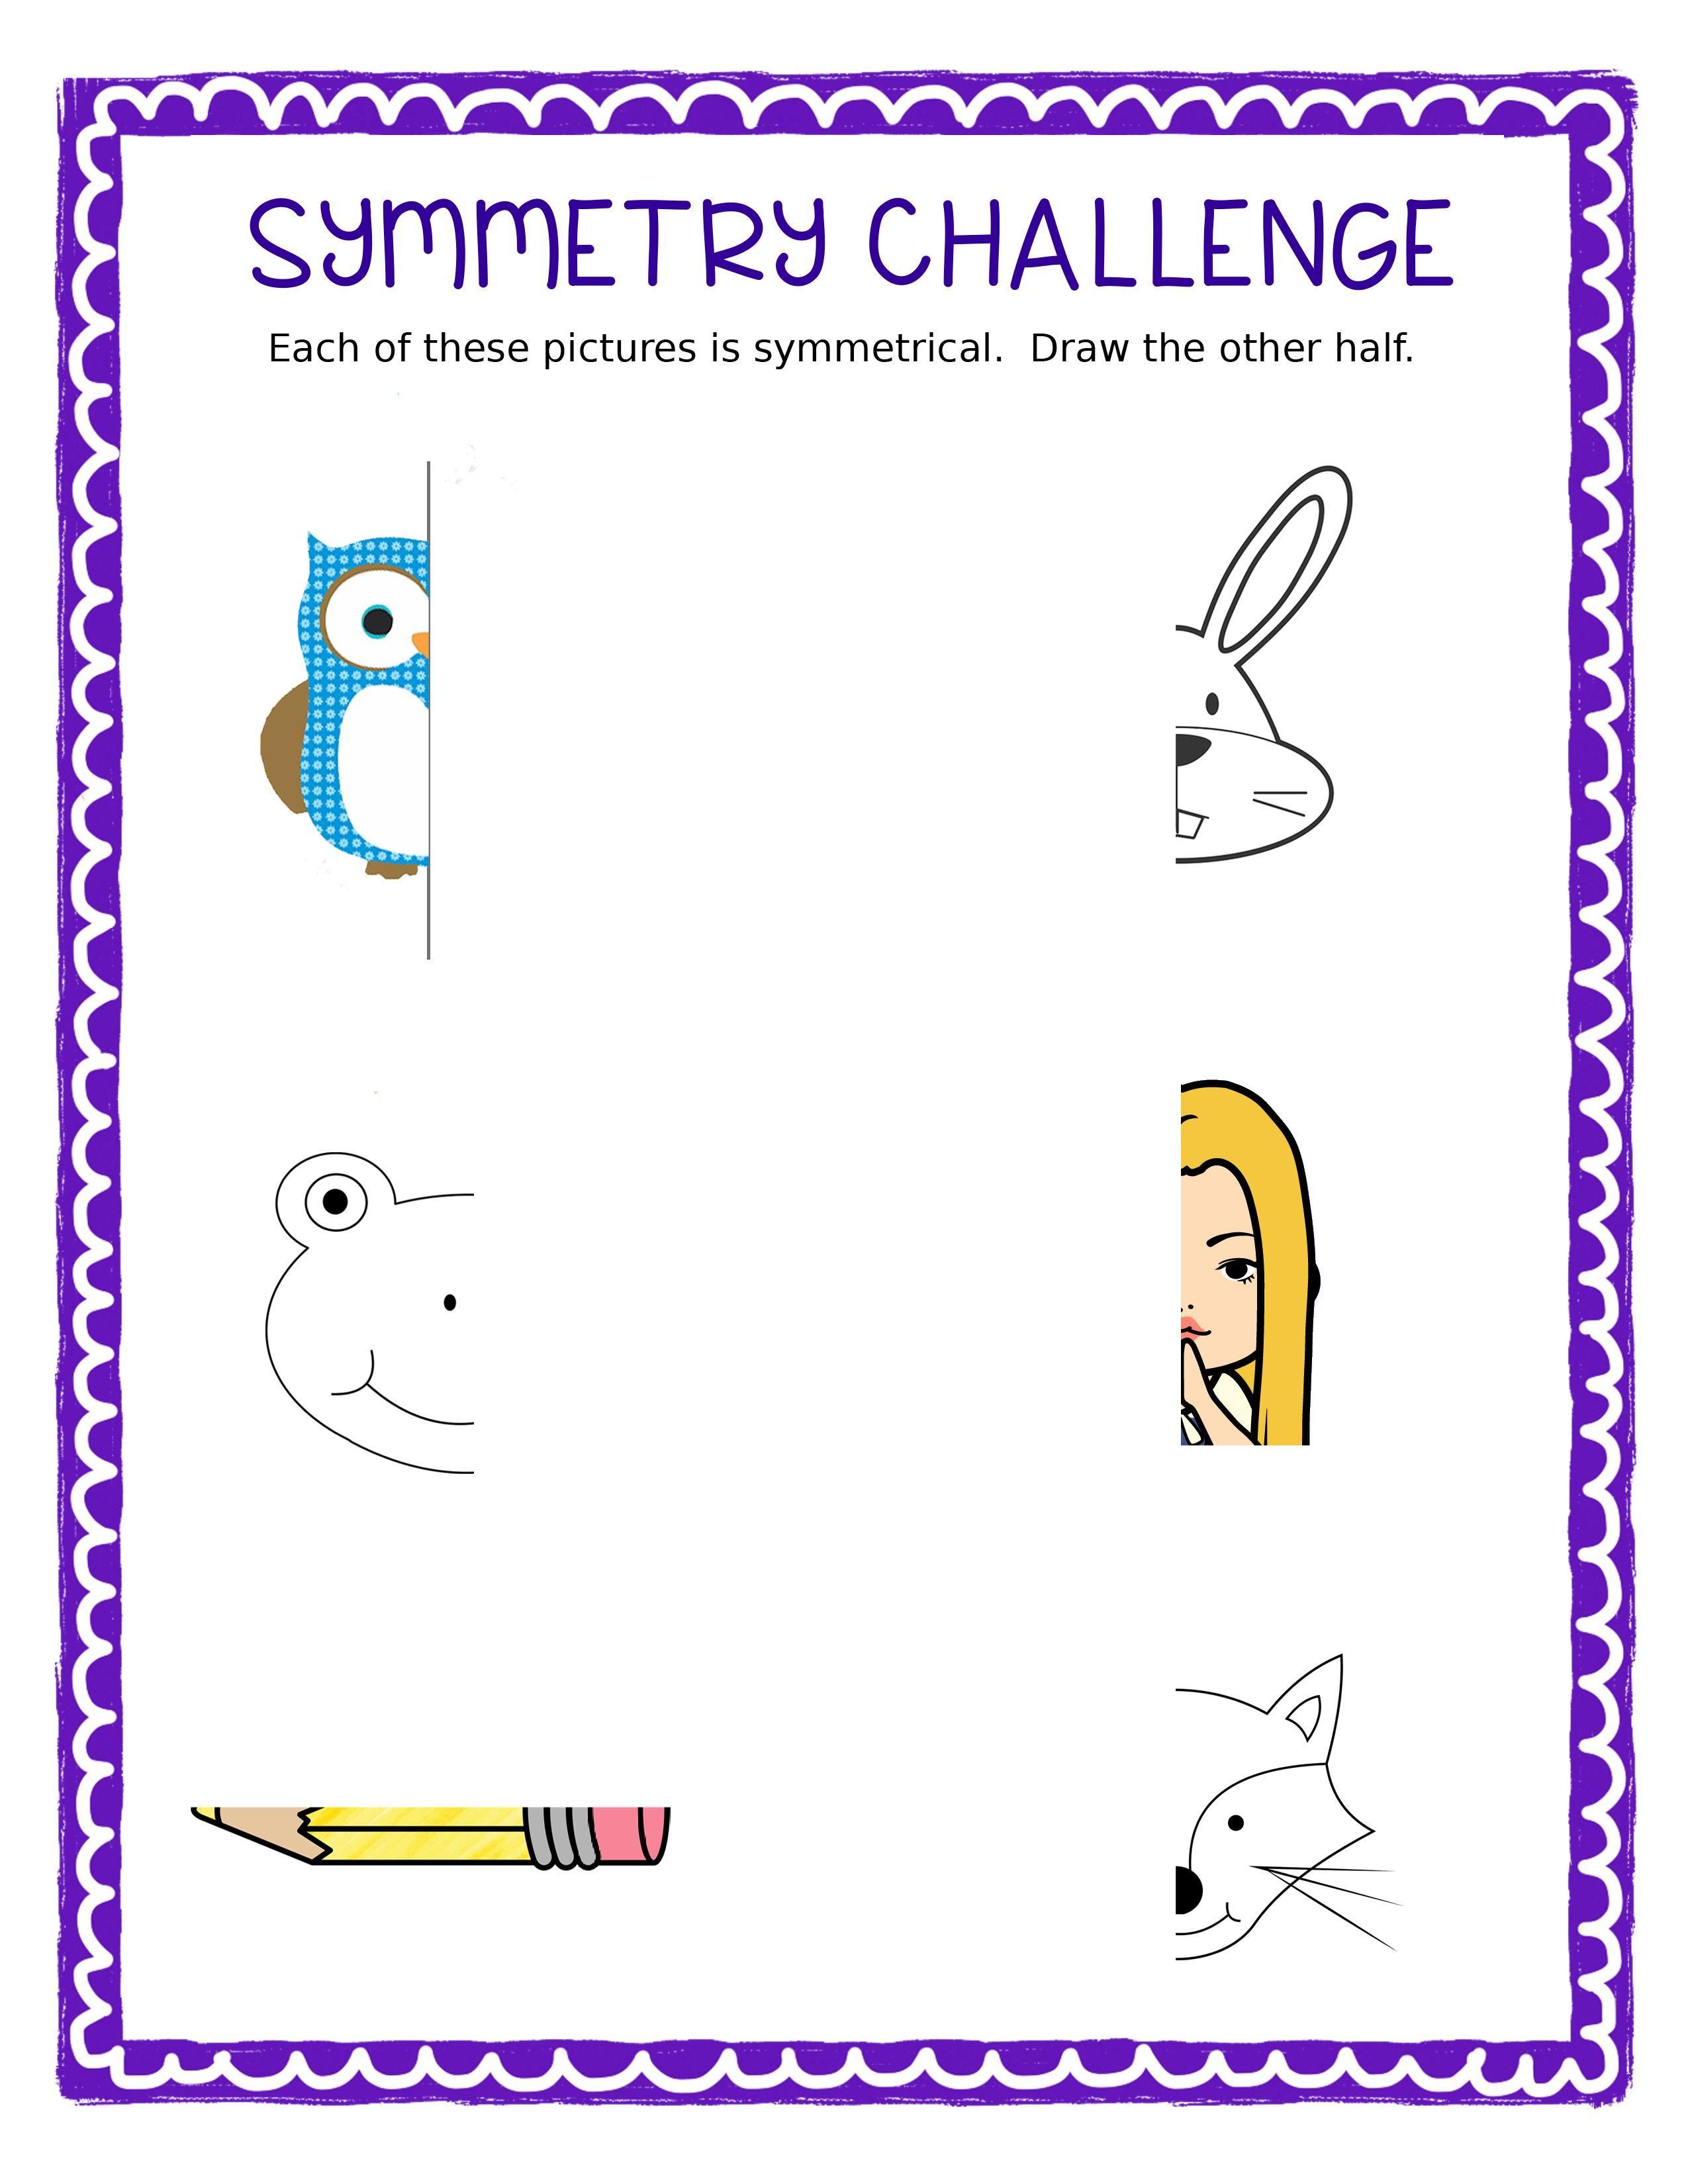 Free Symmetry Challenge Sheet Elementary Art Lesson Plans Art Lessons Elementary Art Lesson Plans [ 3300 x 2550 Pixel ]